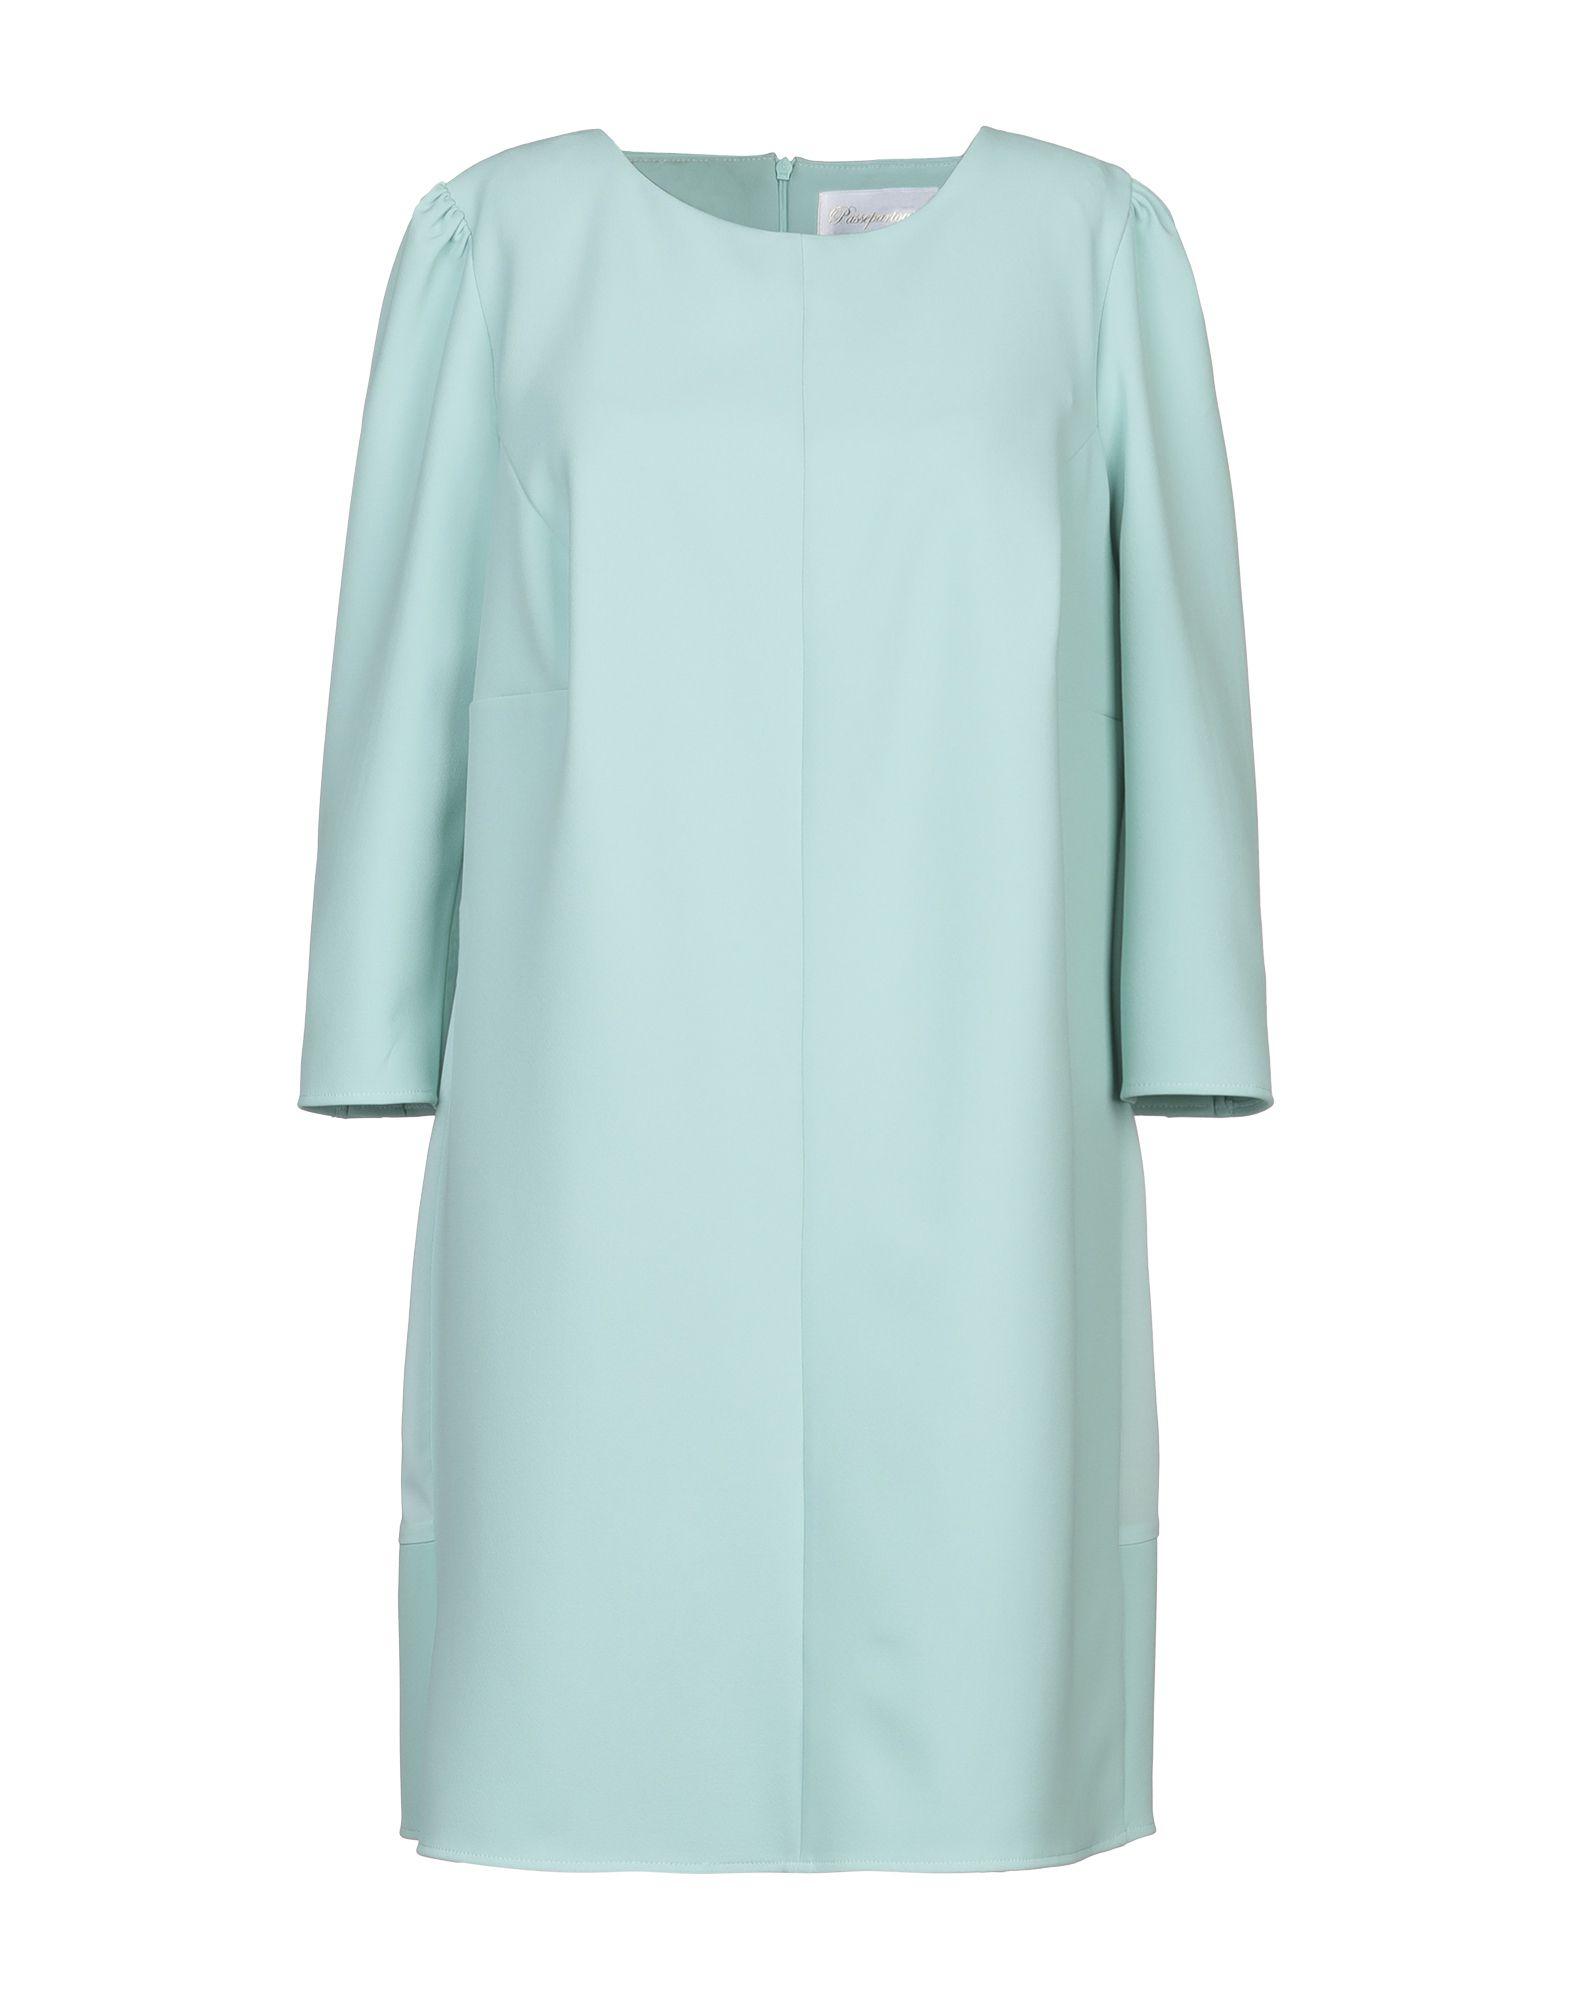 PASSEPARTOUT DRESS by ELISABETTA FRANCHI CELYN b. Короткое платье